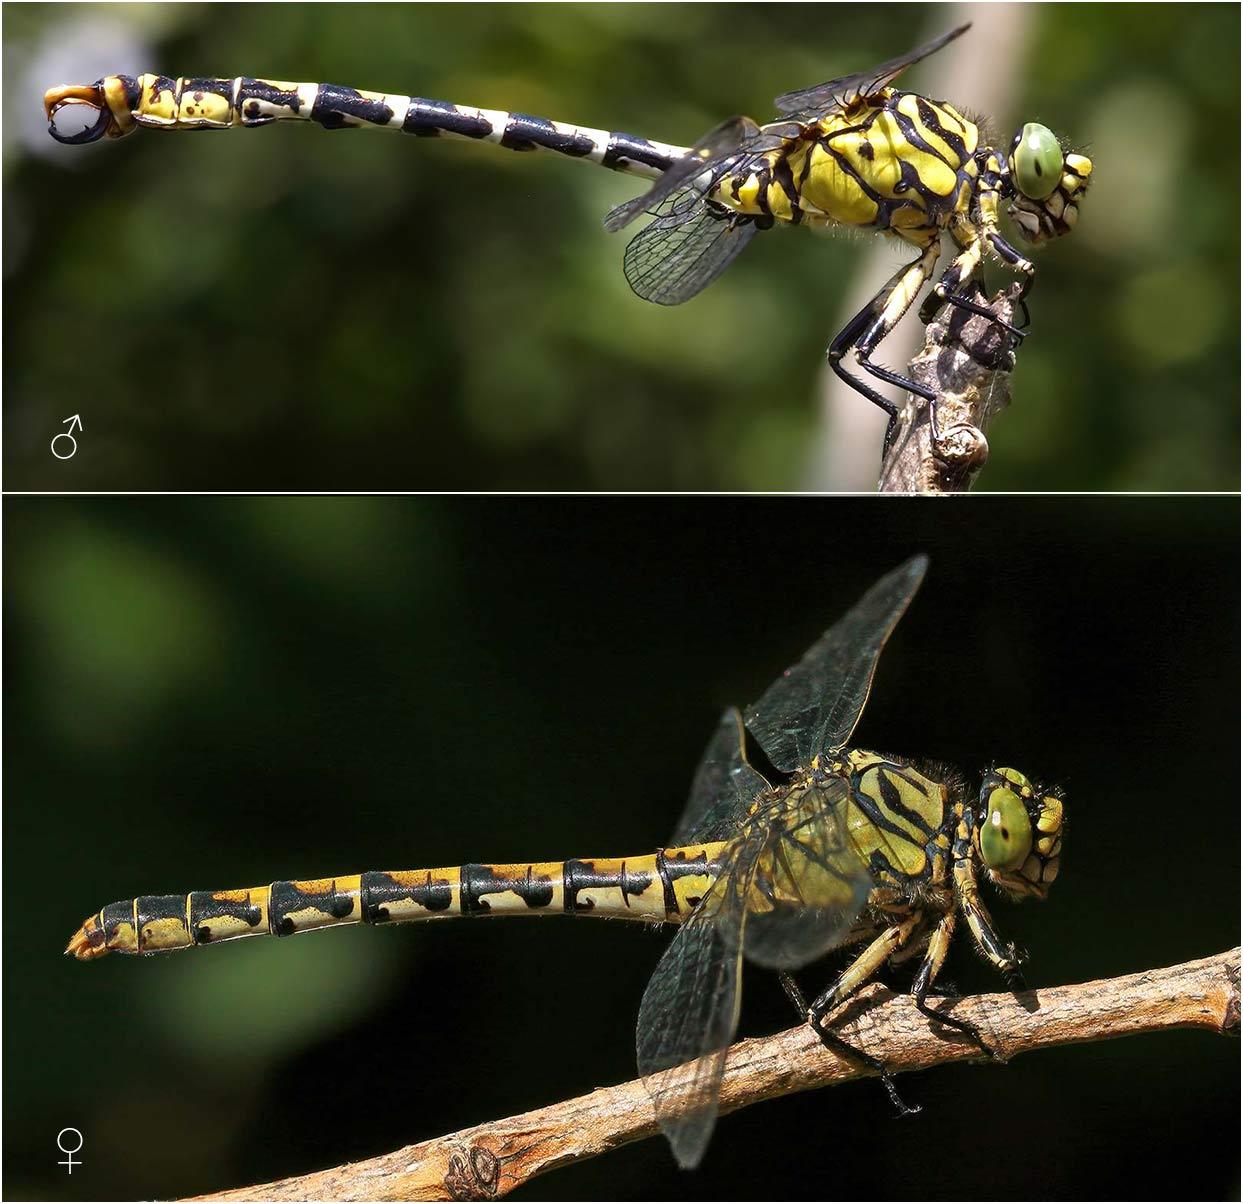 Onychogomphus forcipatus mâle et femelle, France